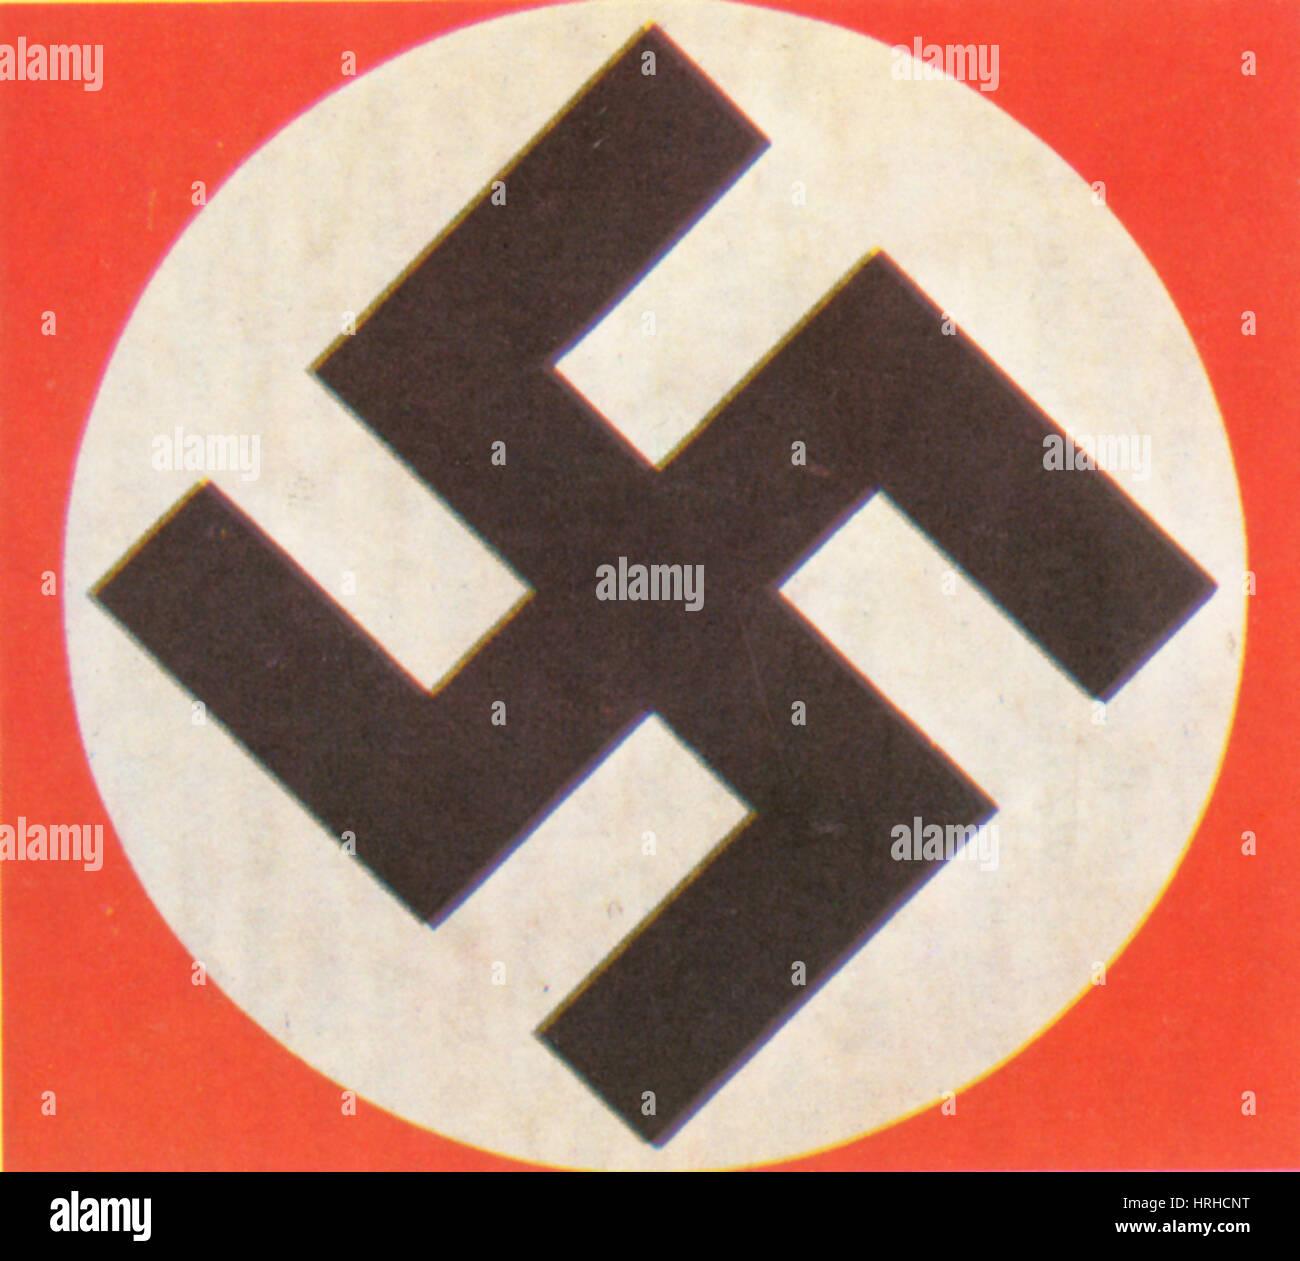 Nazi Swastika - Stock Image